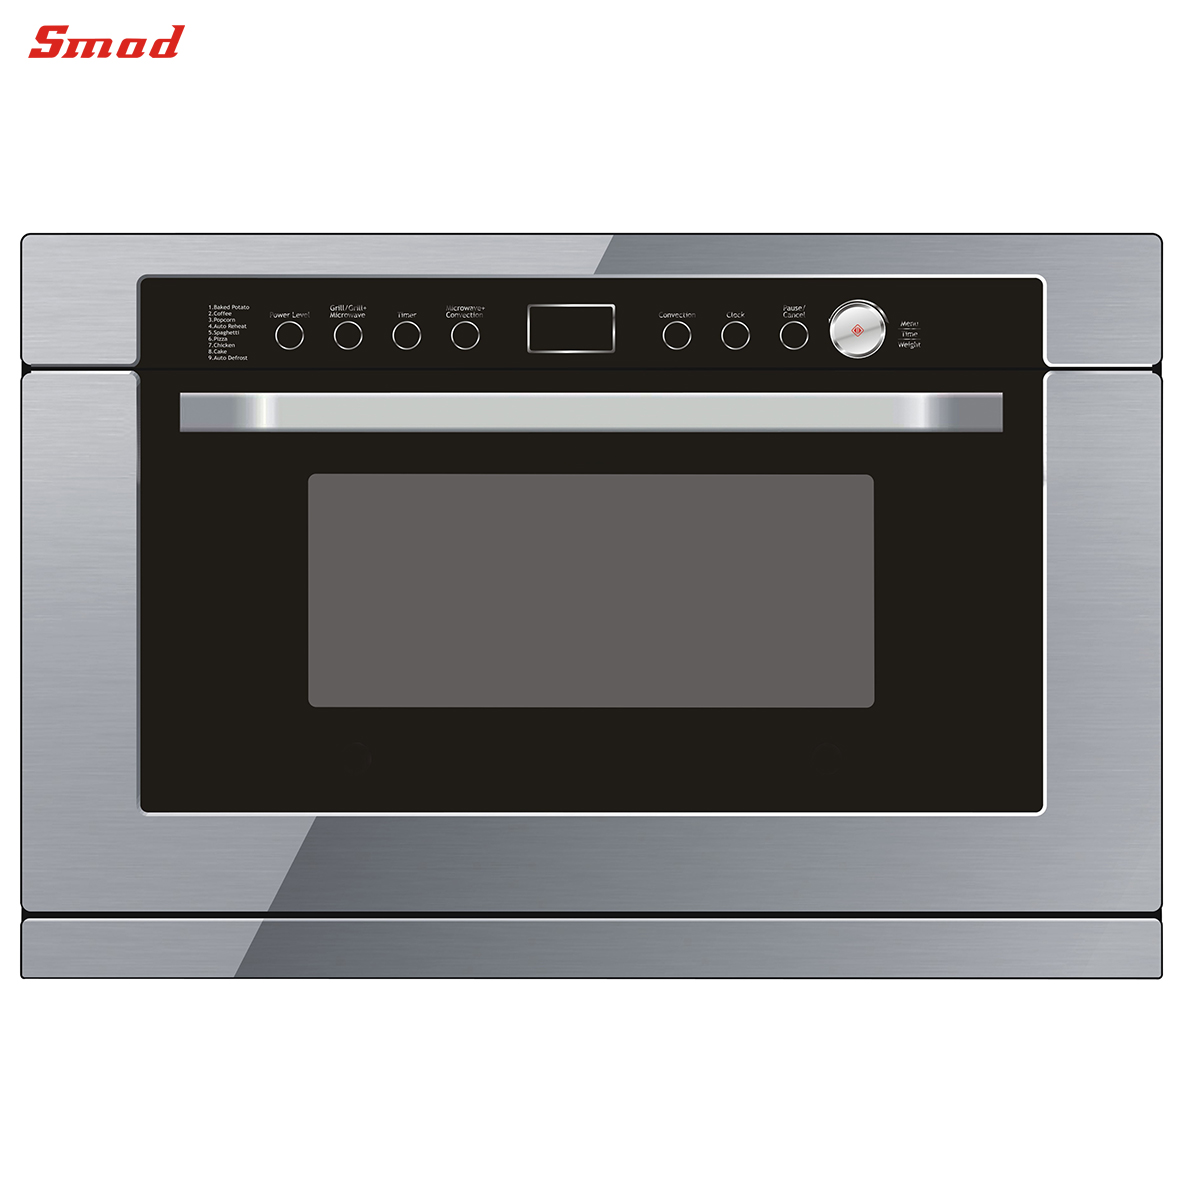 High Quality Home Use 23l Digital Display Built In Microwave Oven - Buy  Microwave Oven,Built In Microwave Oven,Digital Display Microwave Oven  Product